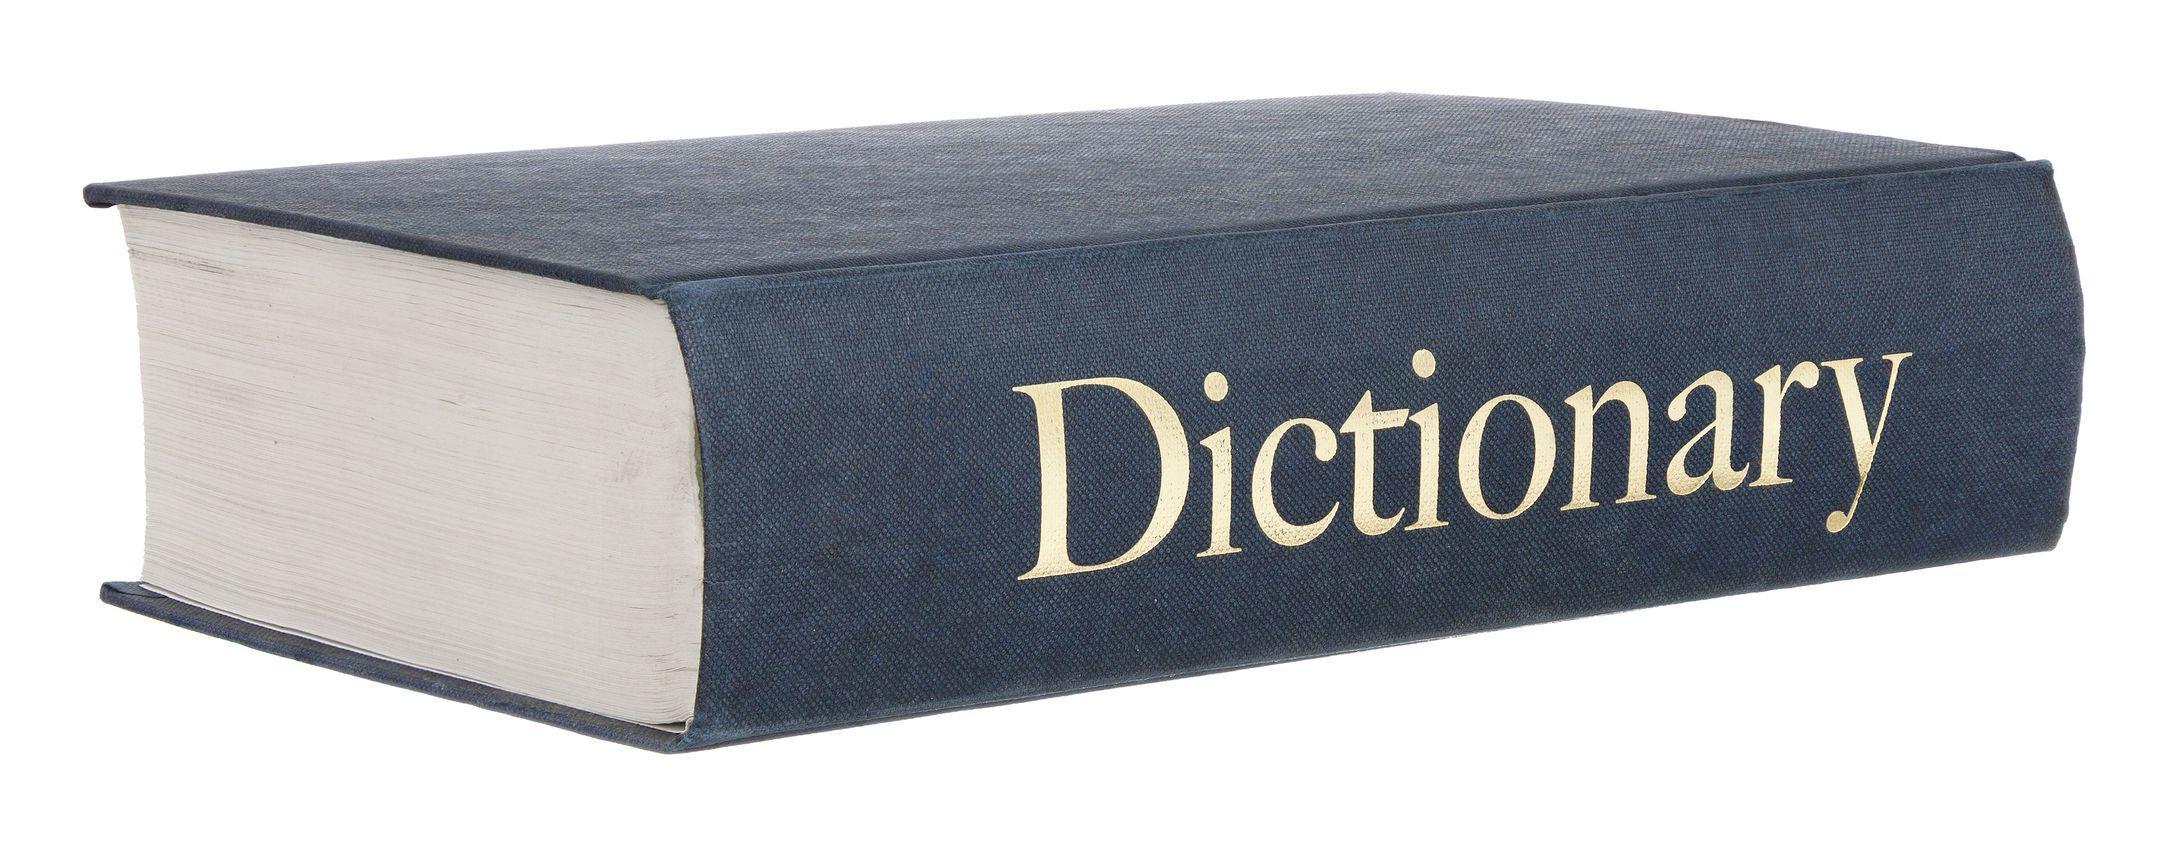 8145849 - dictionary